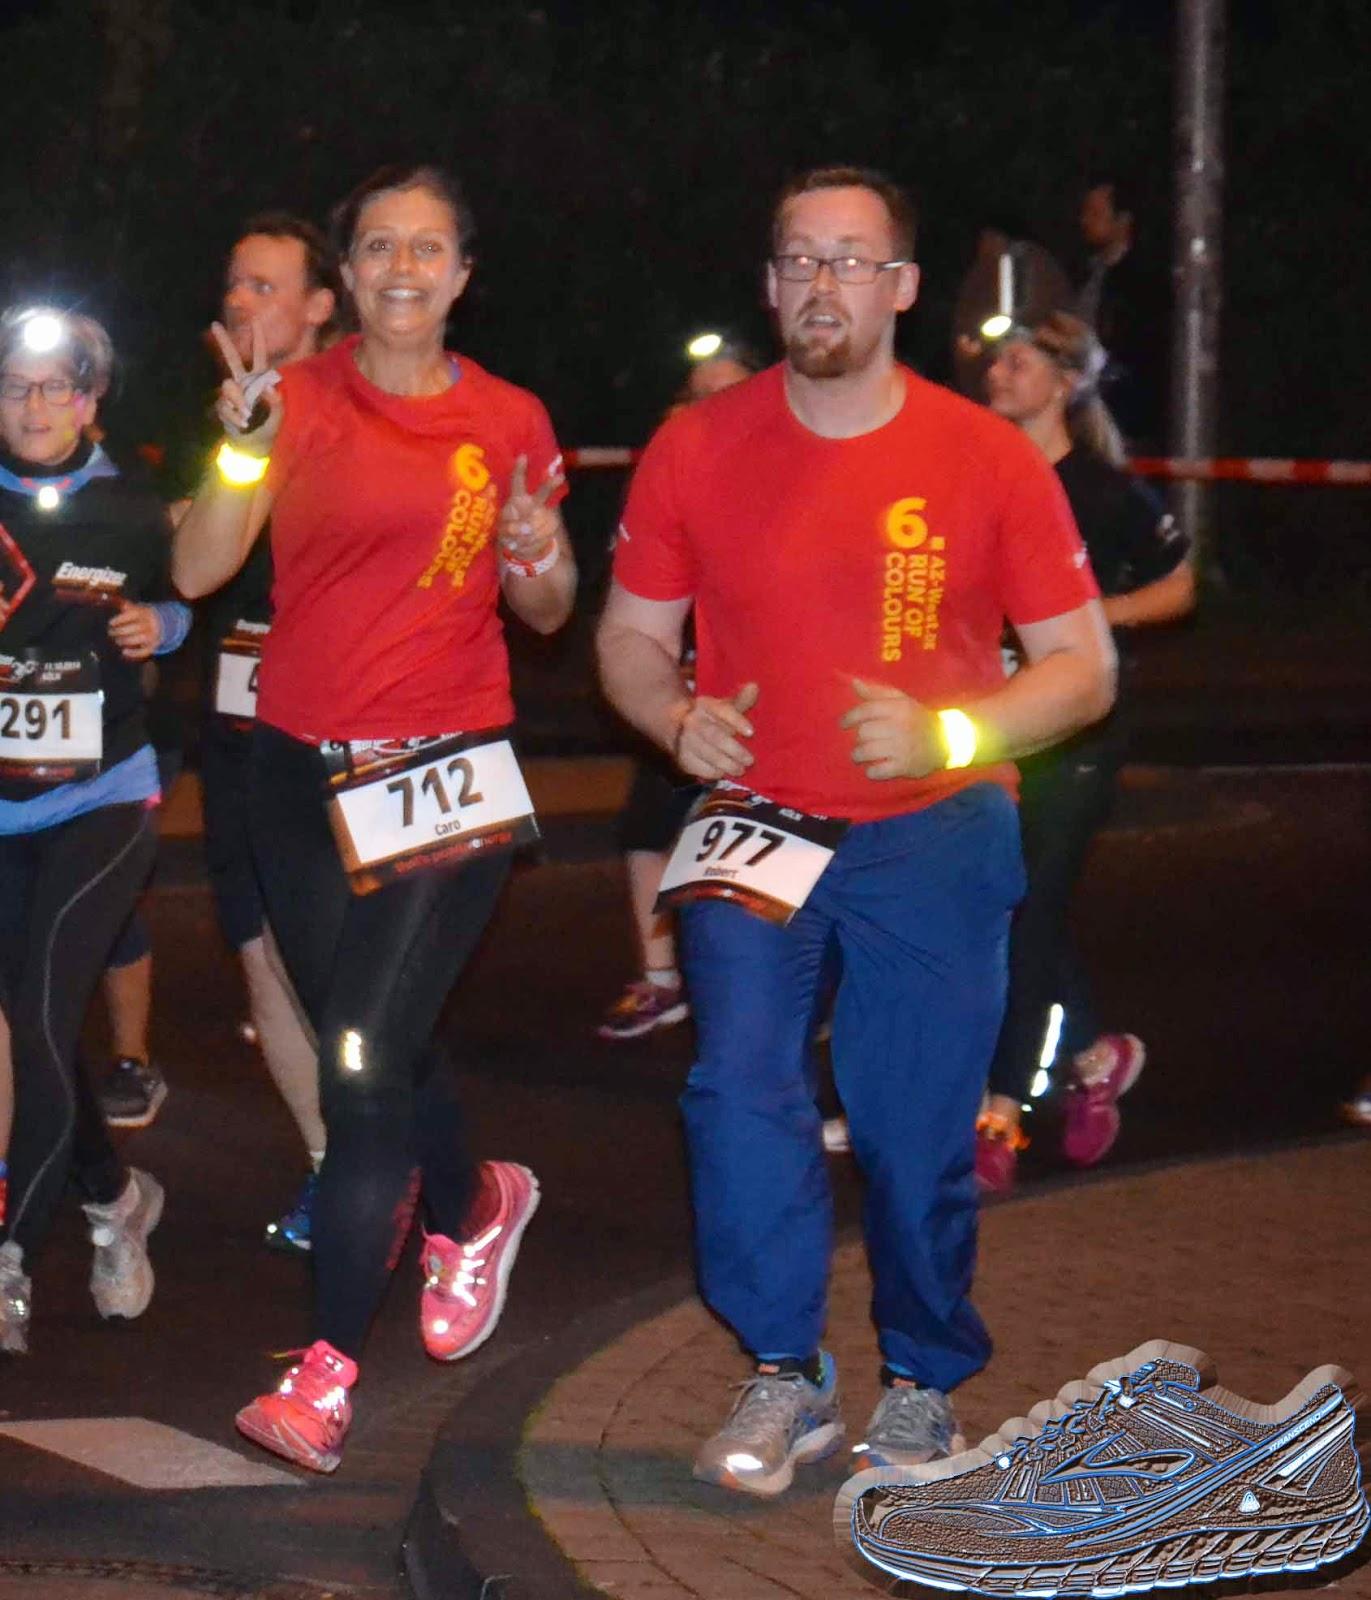 http://meckycaro.blogspot.de/2014/10/wettkampf-energizer-nightrun-koln.html